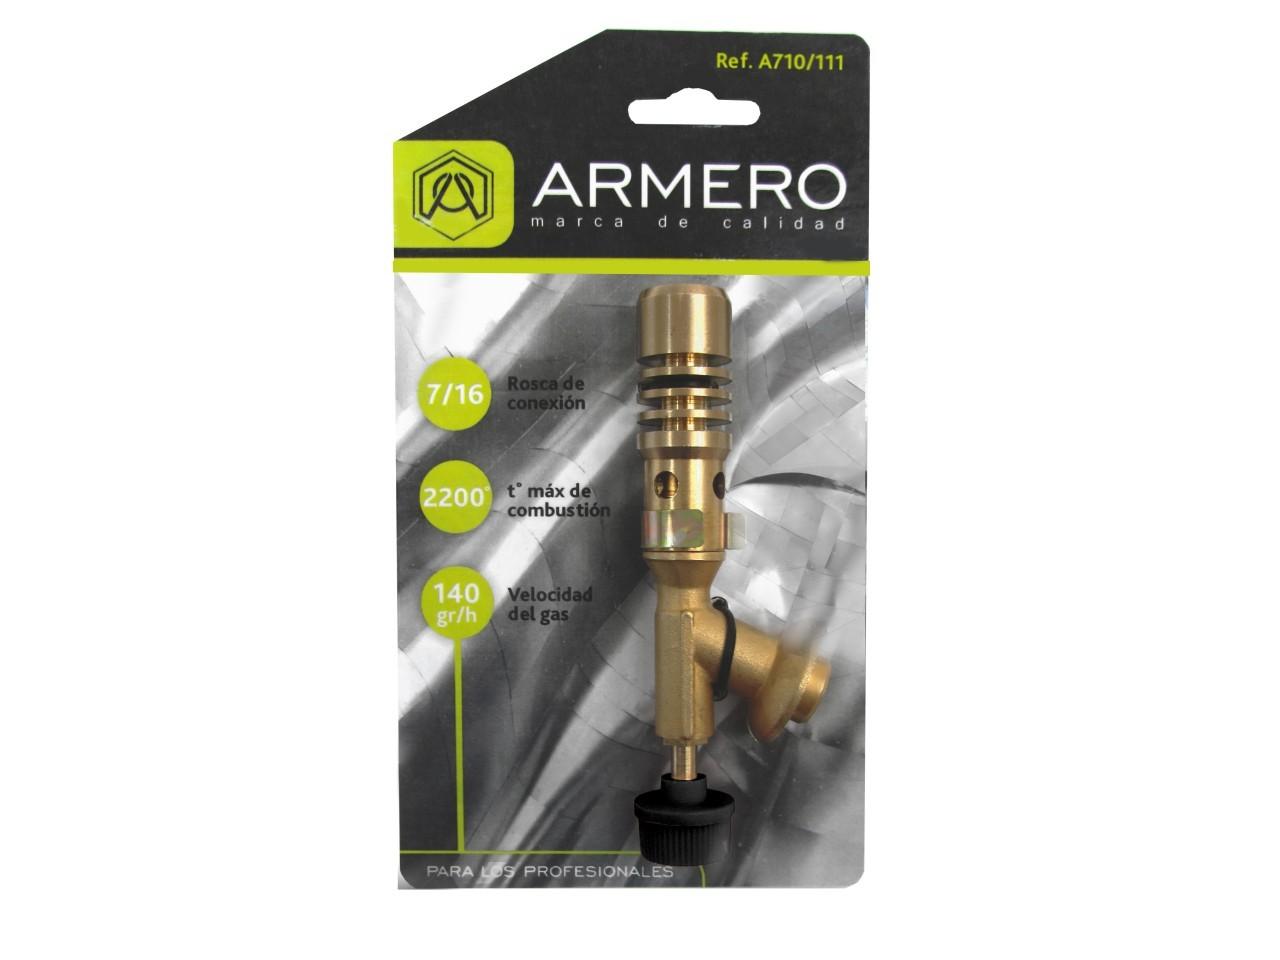 Горелка газовая Armero Ag10-111